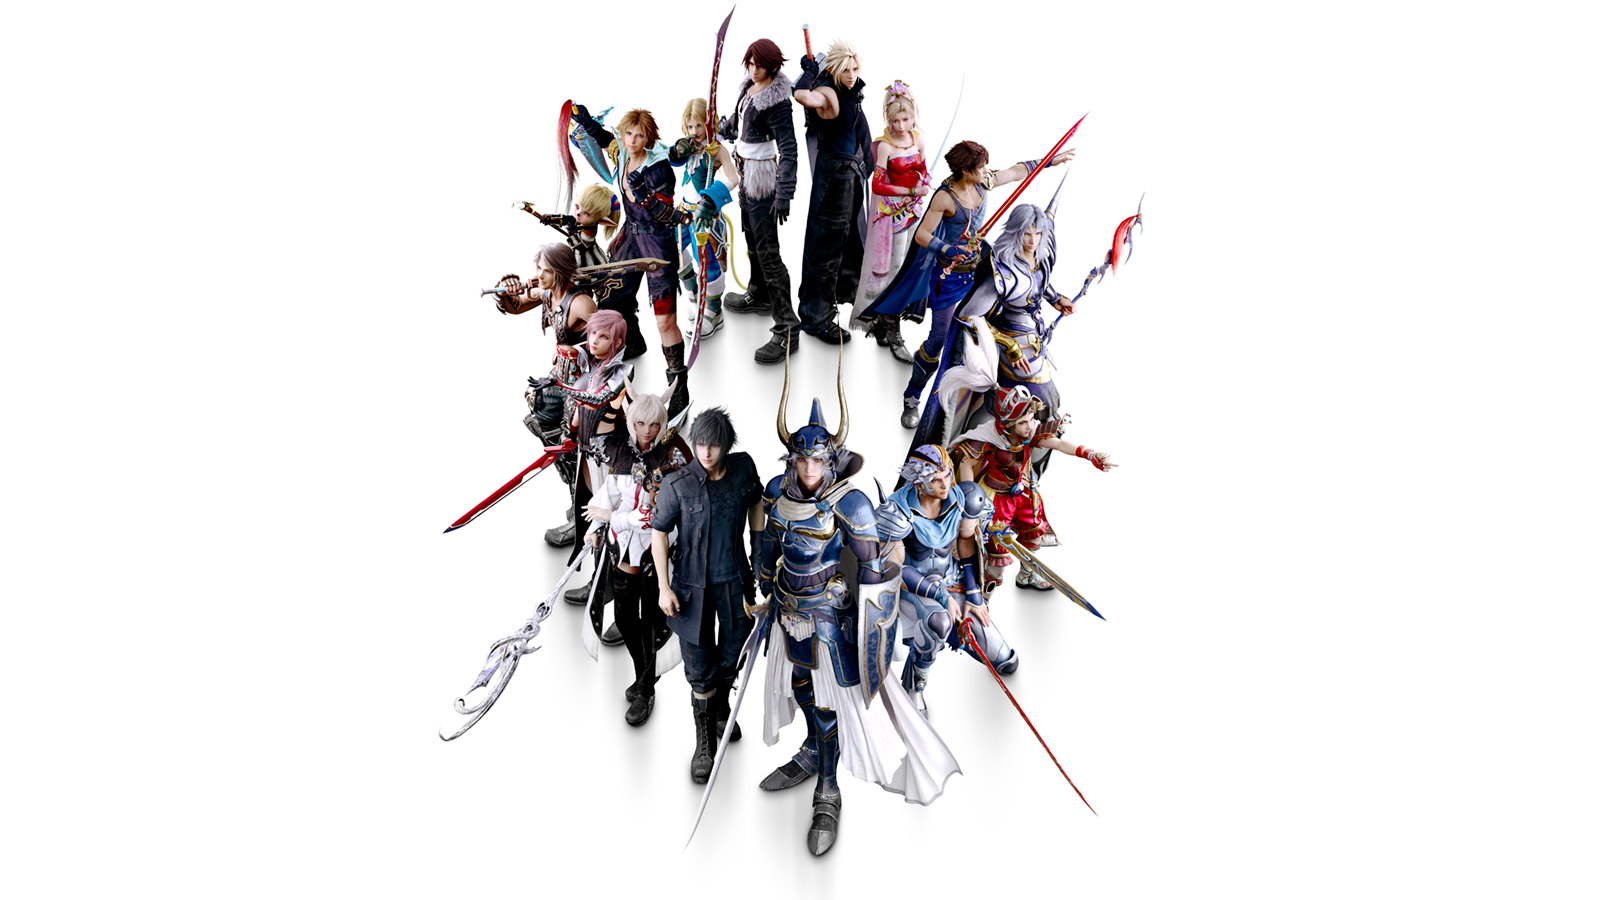 Free Dissidia Final Fantasy NT Wallpaper in 1600x900